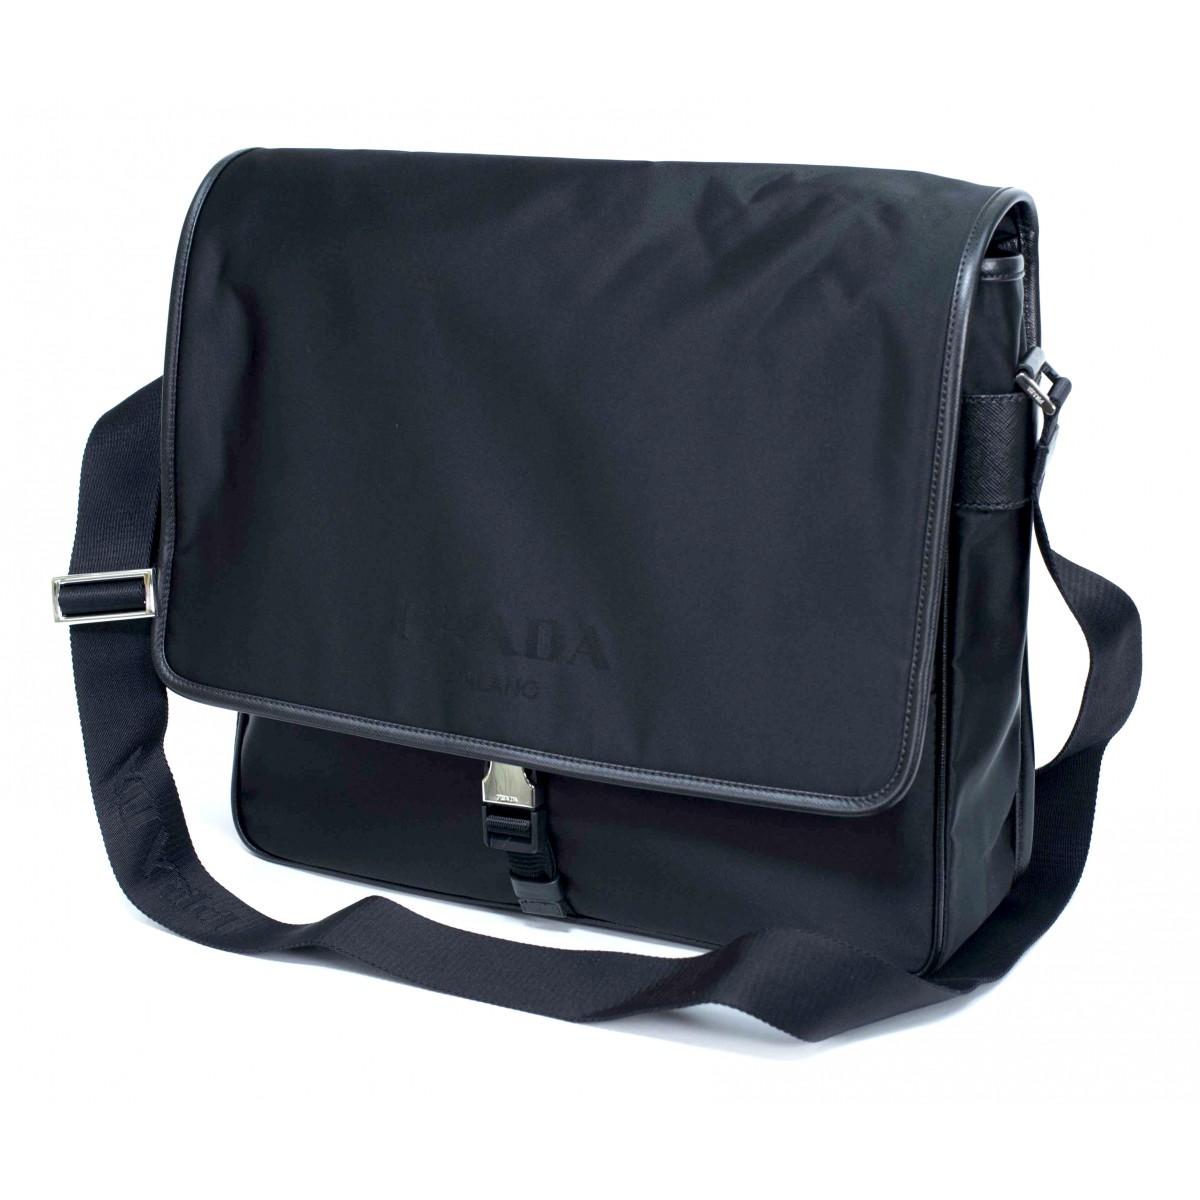 6a18bf21cdd2 ... shoulder bag messenger bag amazon shoes bags canada prada bag v158 064  f0002 nylon black dadb7 b0377 canada prada bag v158 064 f0002 nylon black  dadb7 ...